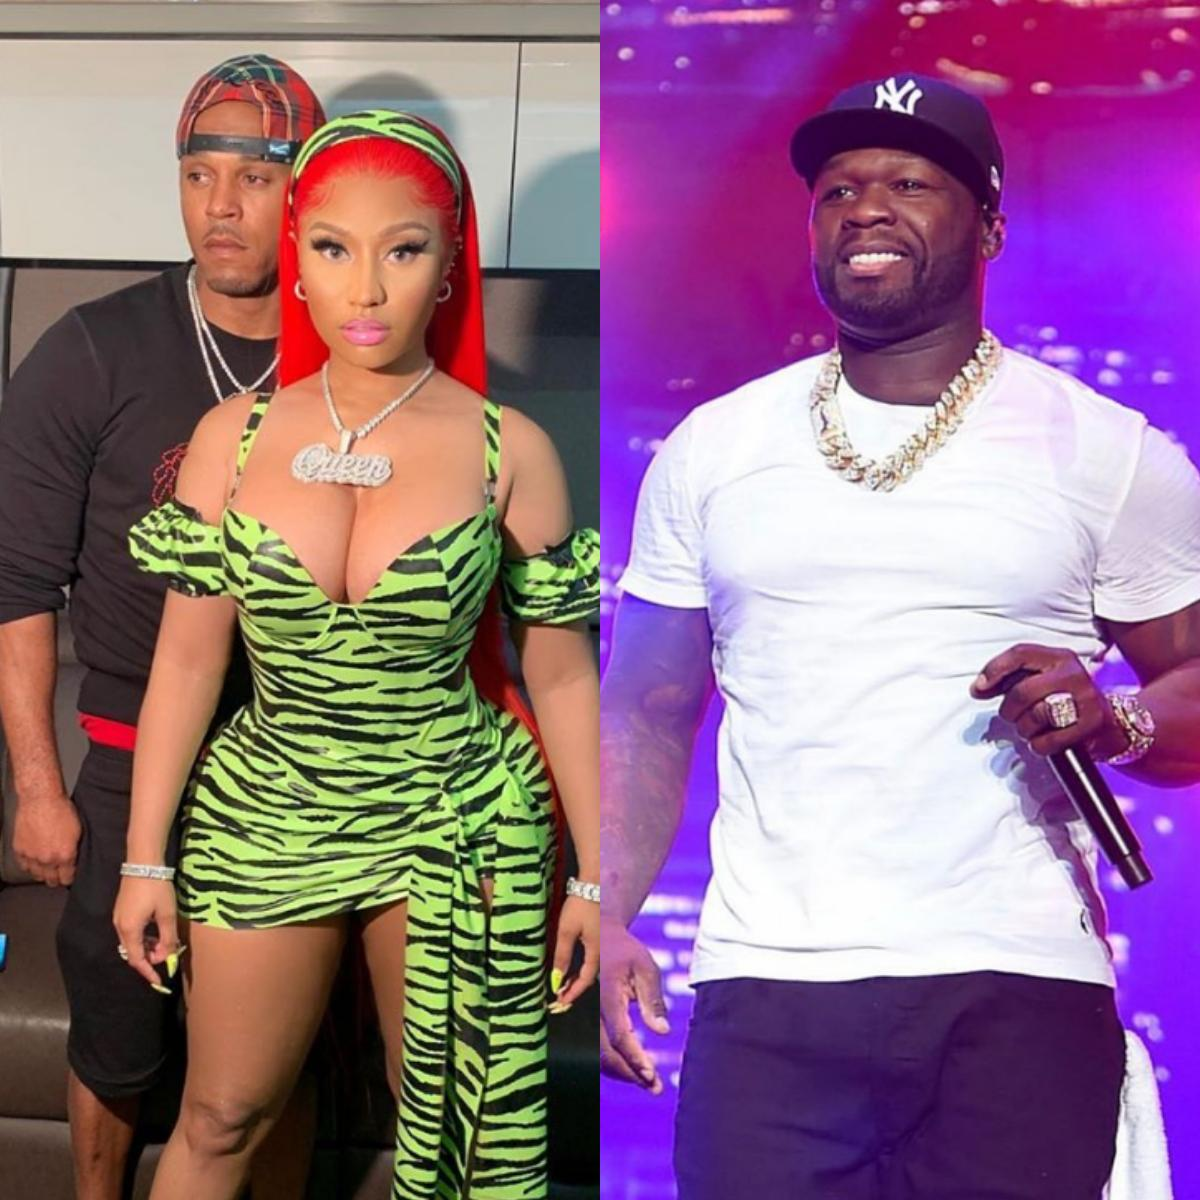 50 Cent Reacted To Nicki Minaj Retirement Announcement